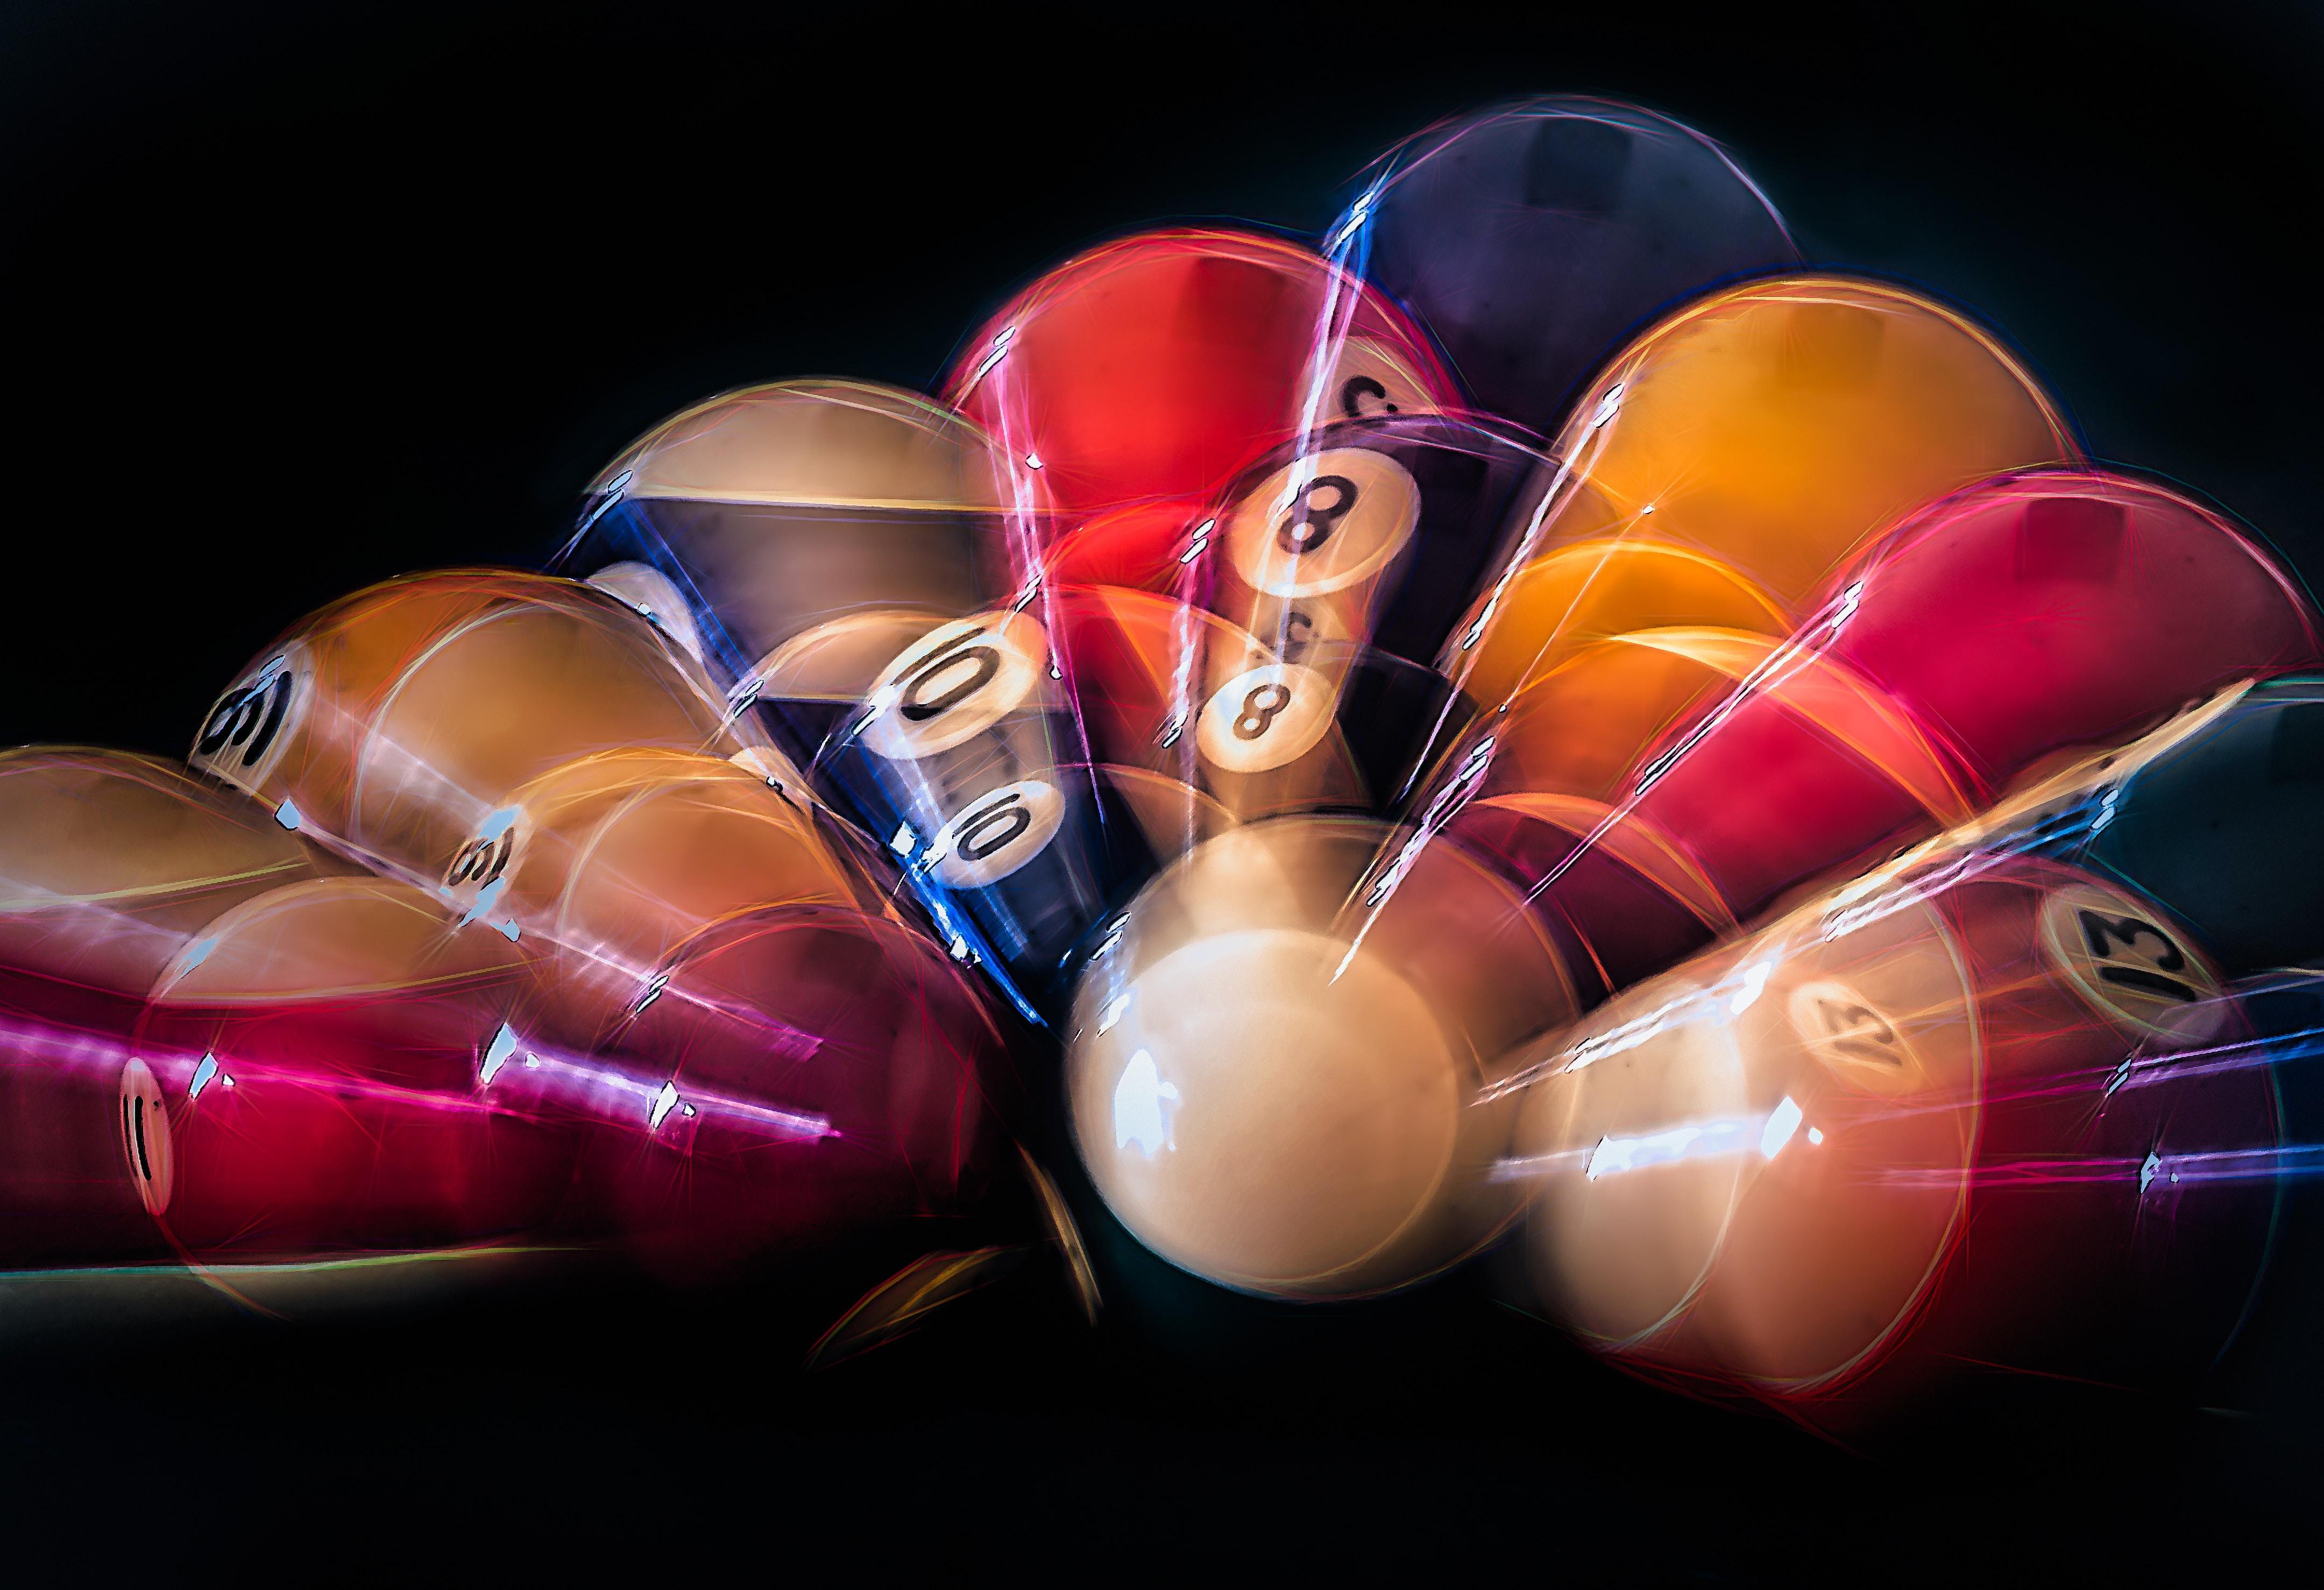 photo of pool balls